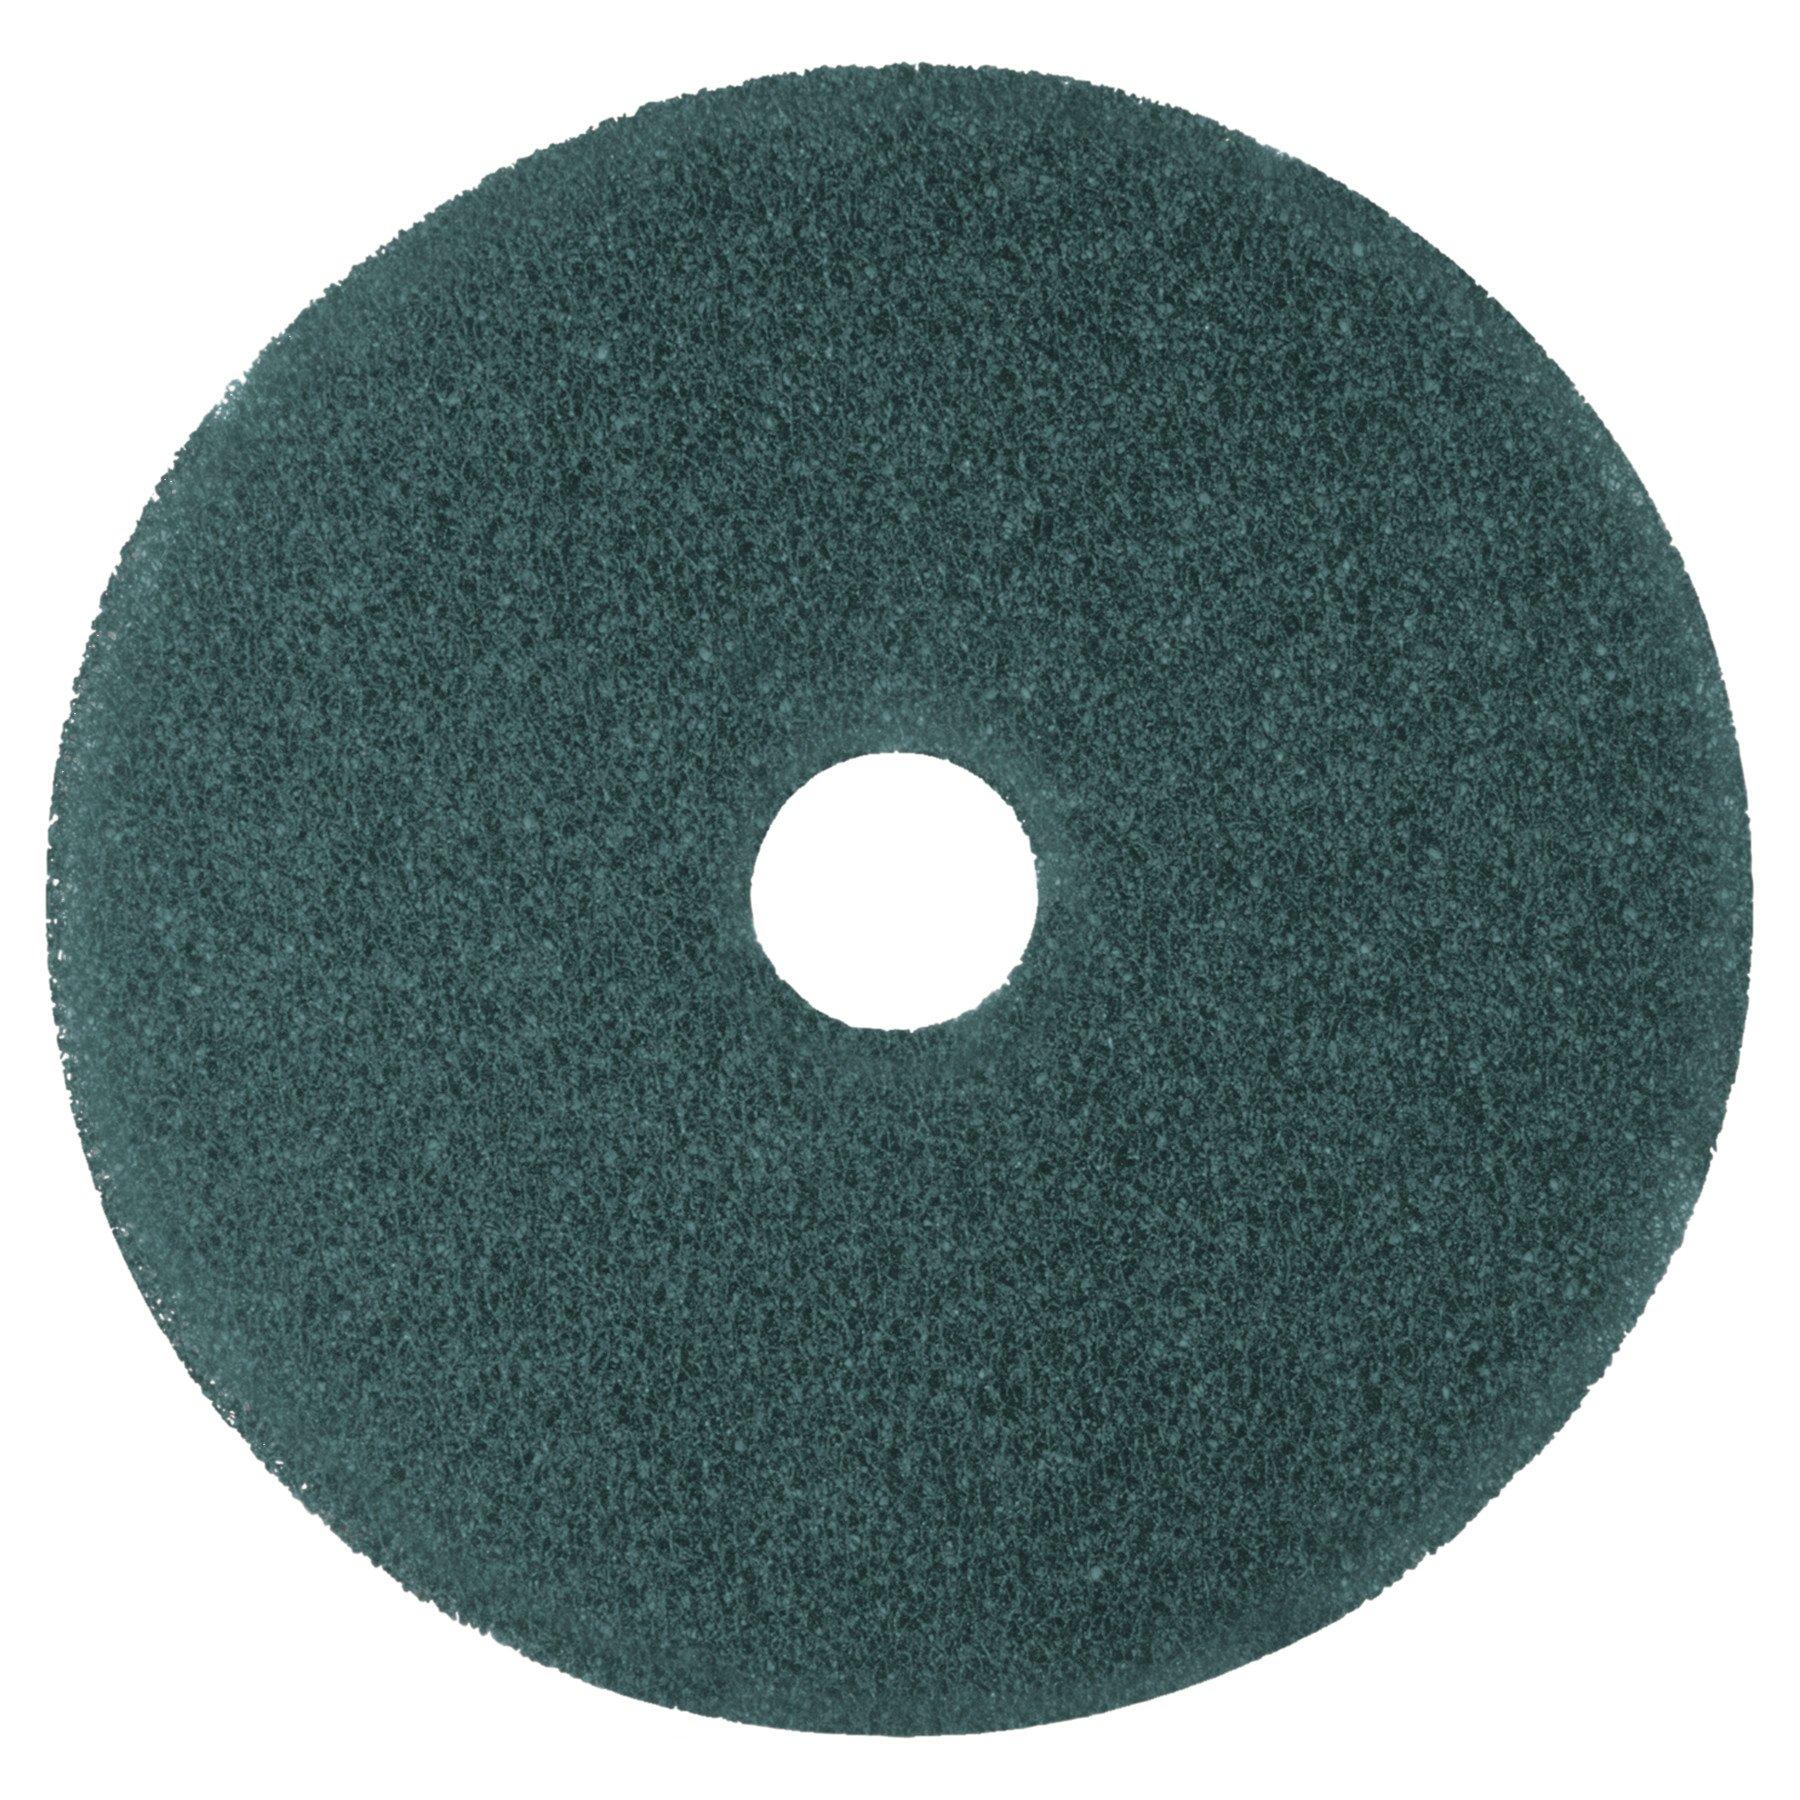 3M Blue Cleaner Pad 5300, 17'' Floor Care Pad (Case of 5)